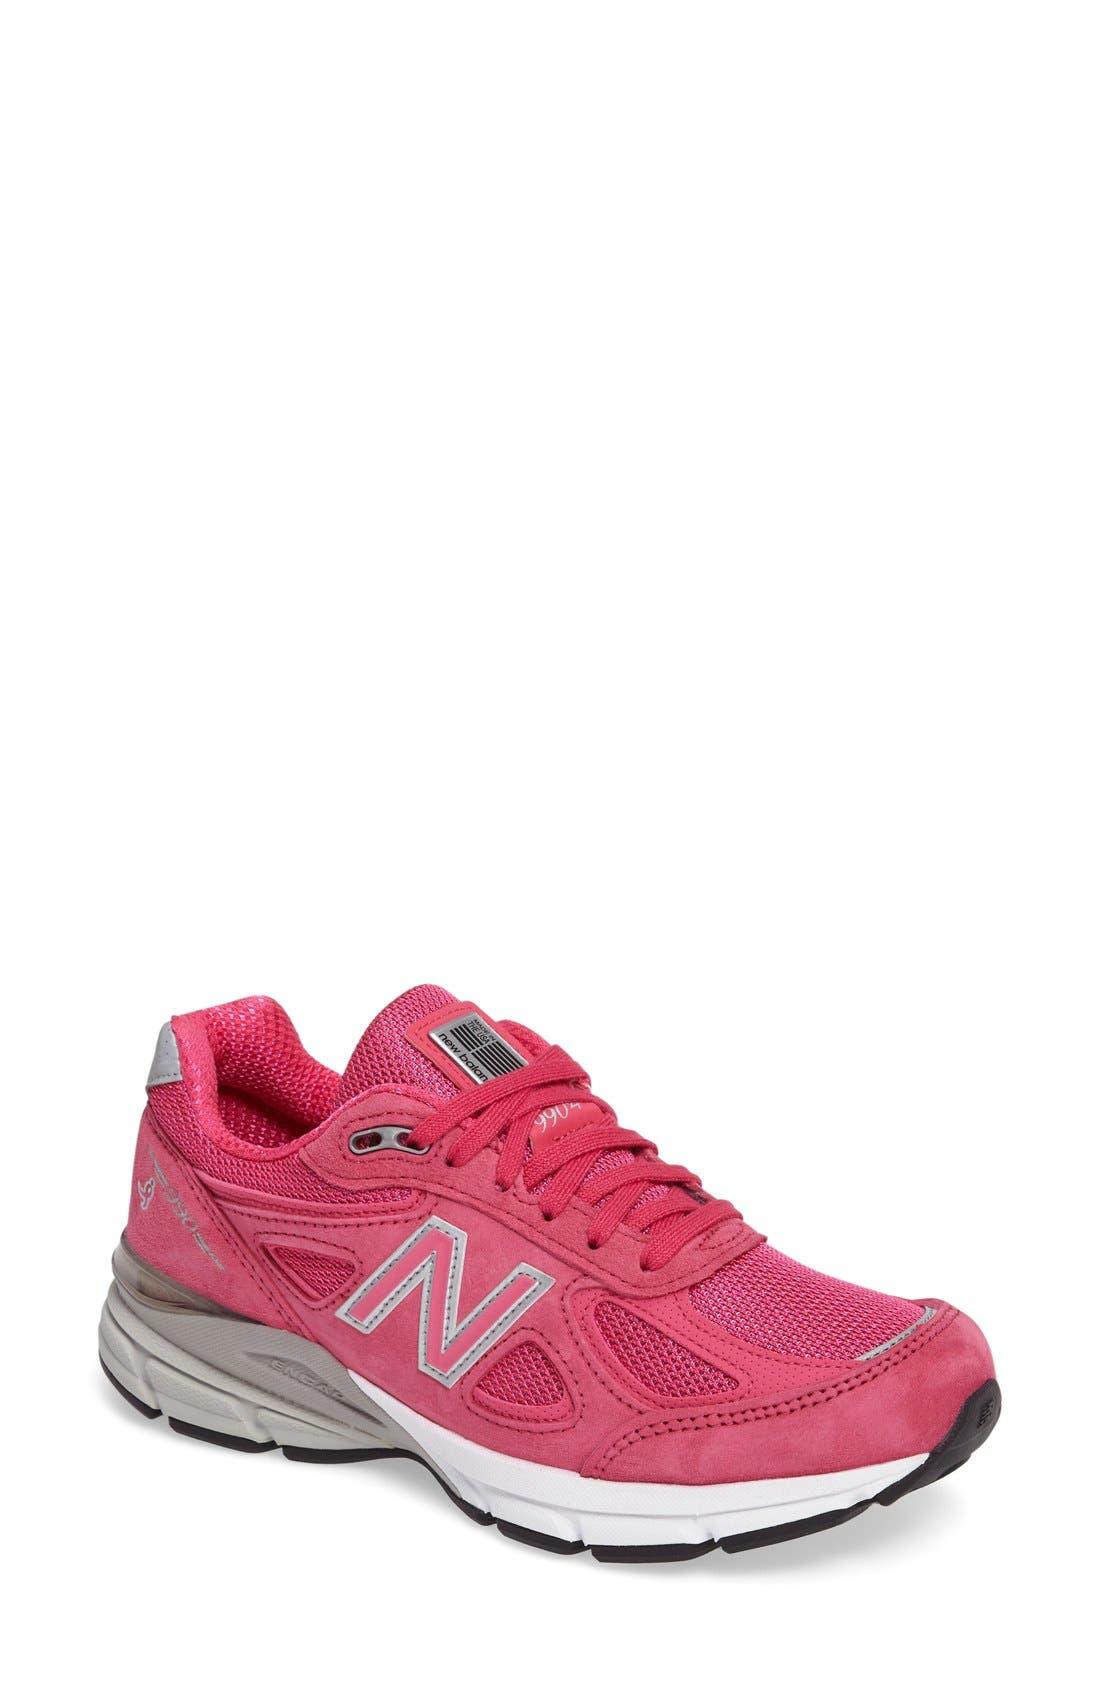 new balance shoes 990